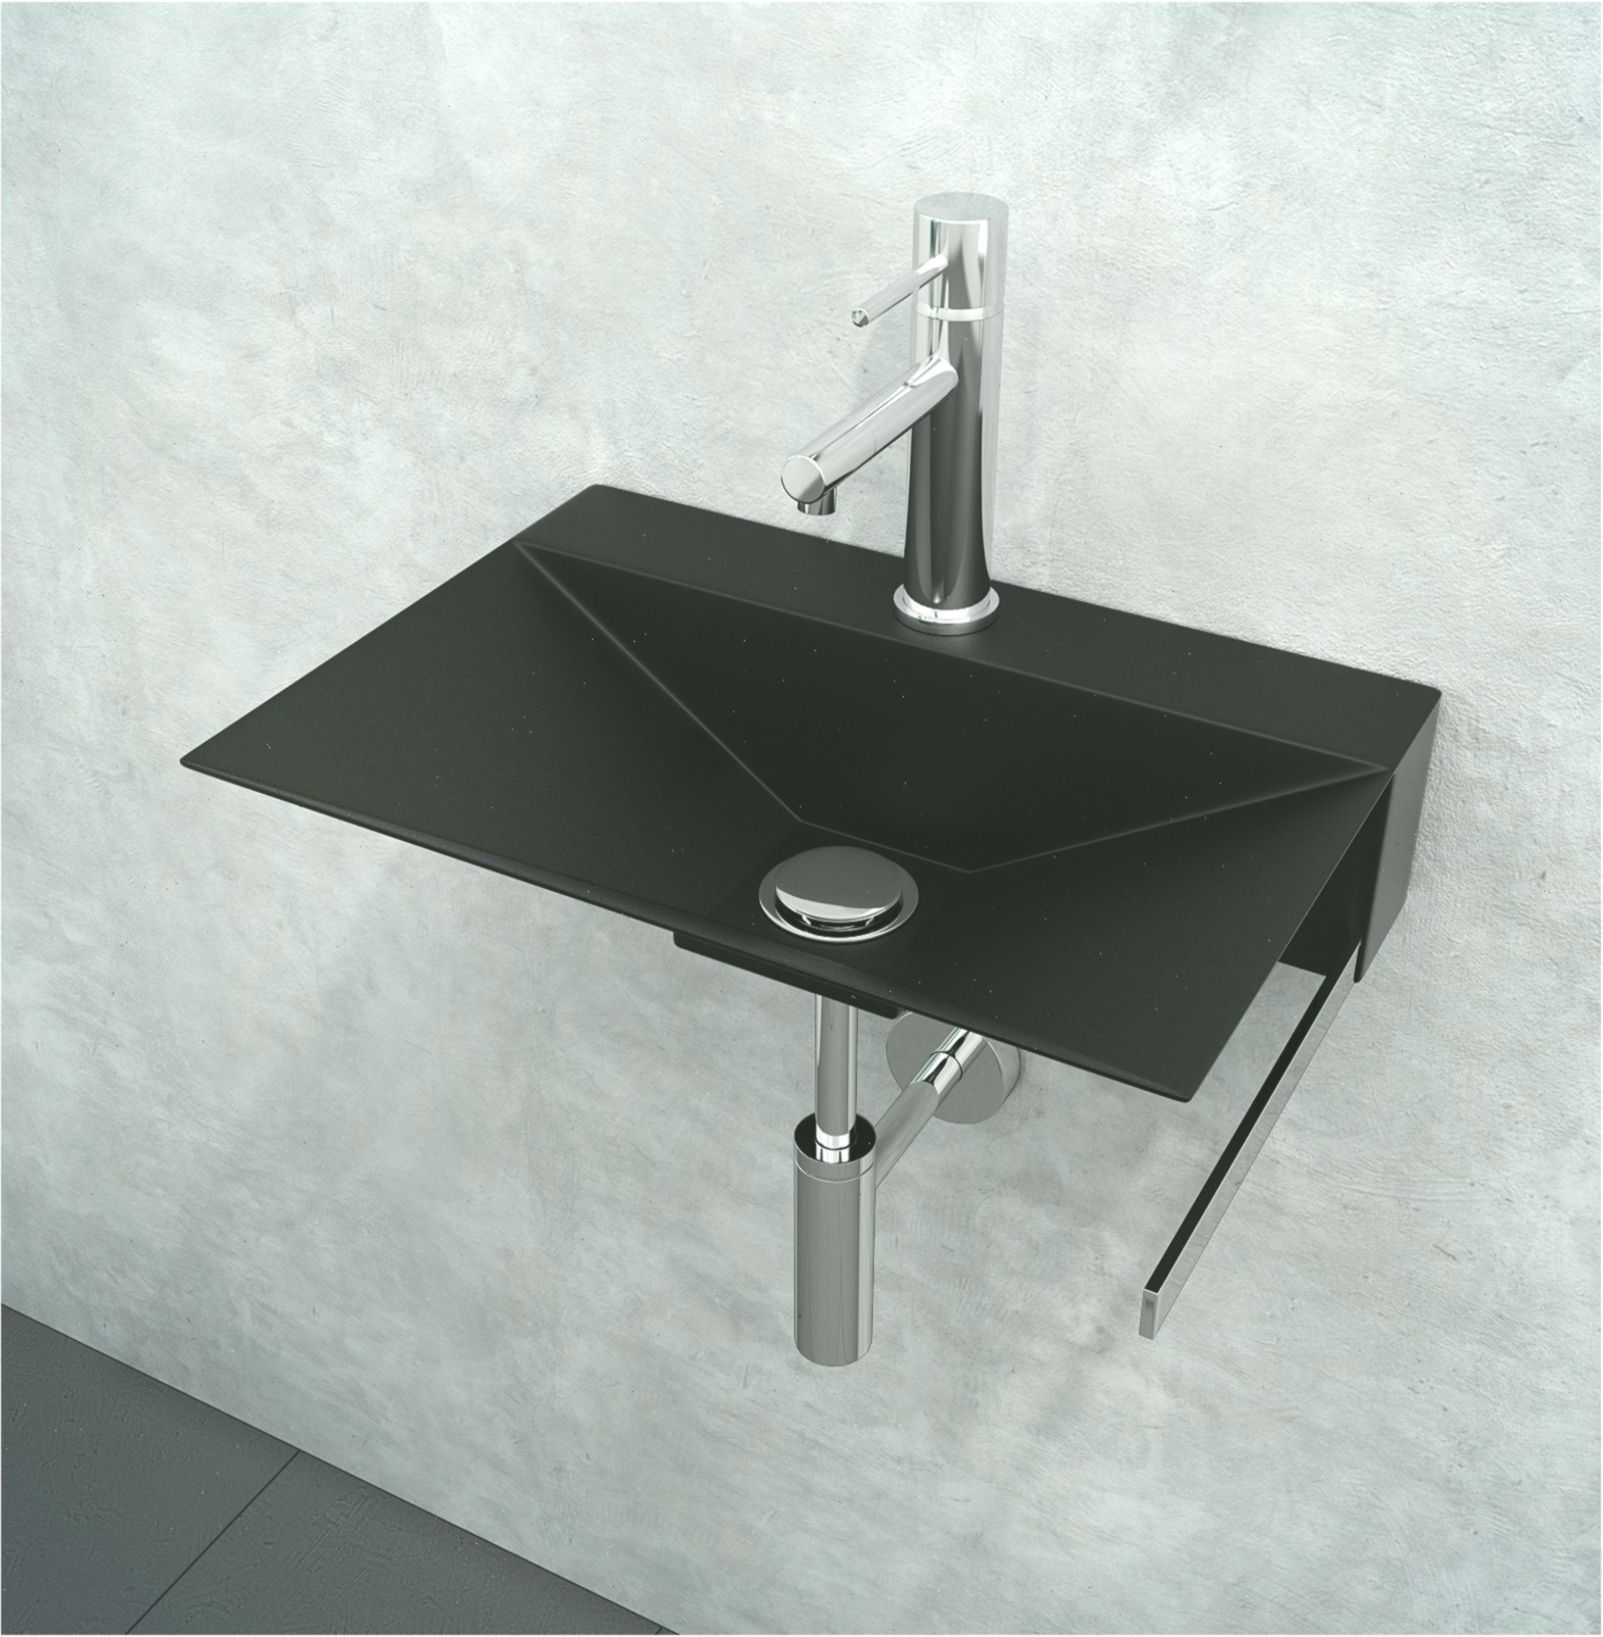 Minimal 15 3 4 Wall Bathroom Washbasin Sink Lavatory Vanity Stainless Steel With Towel Bar Bauernspleausedelstahl Bar Bathroom Towel Bar Wash Basin Sink